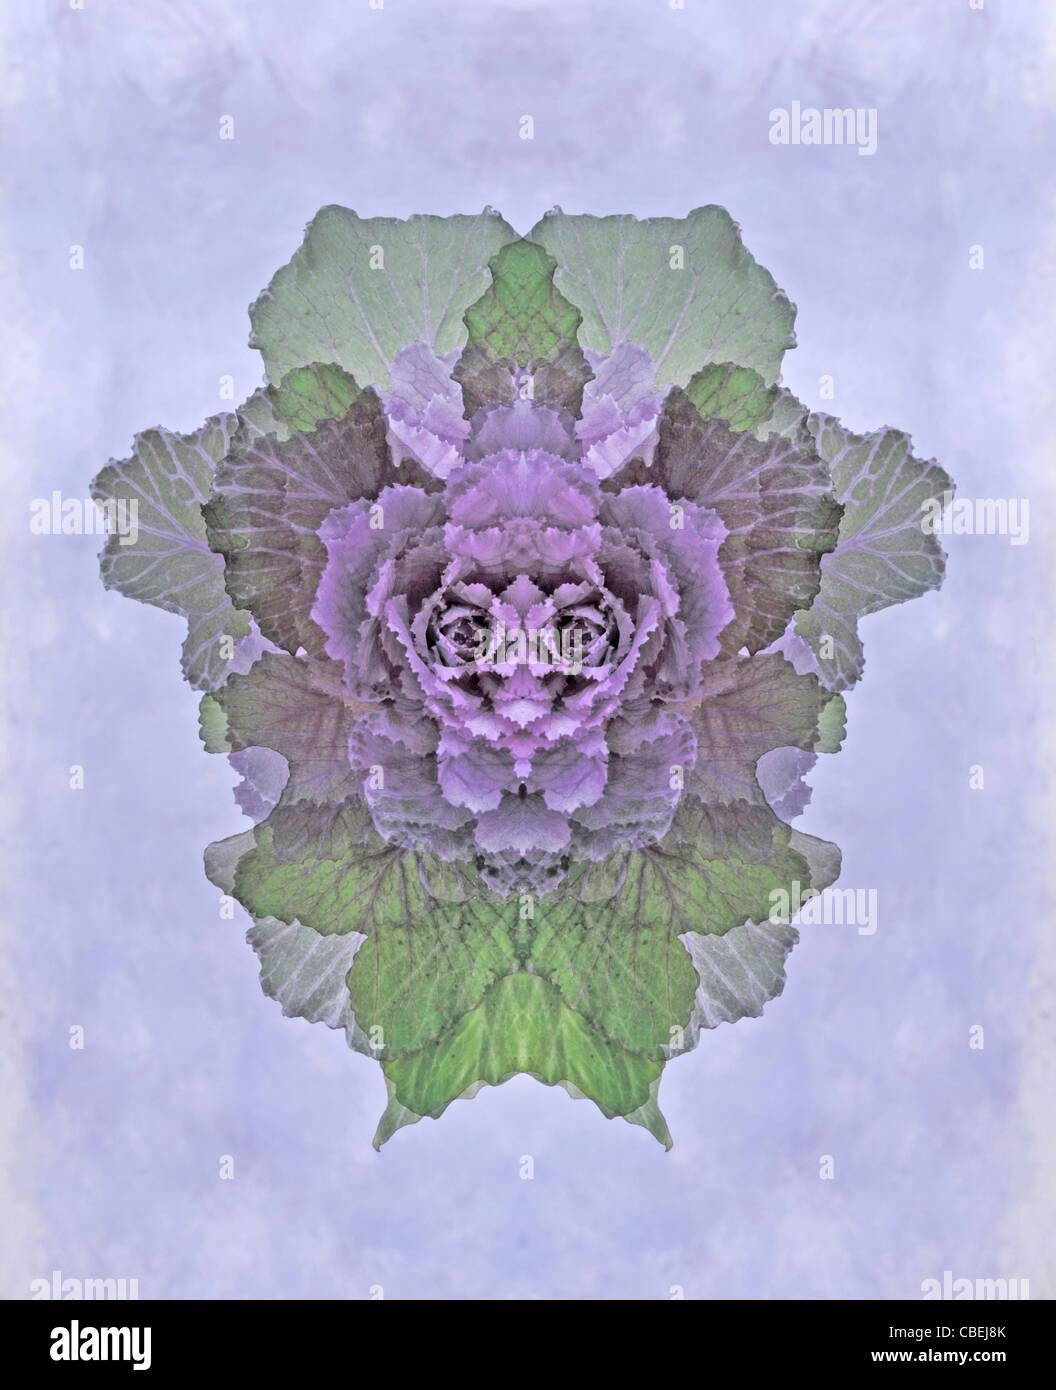 Brassica oleracea, Ornamental cabbage, Purple subject, Grey background. - Stock Image